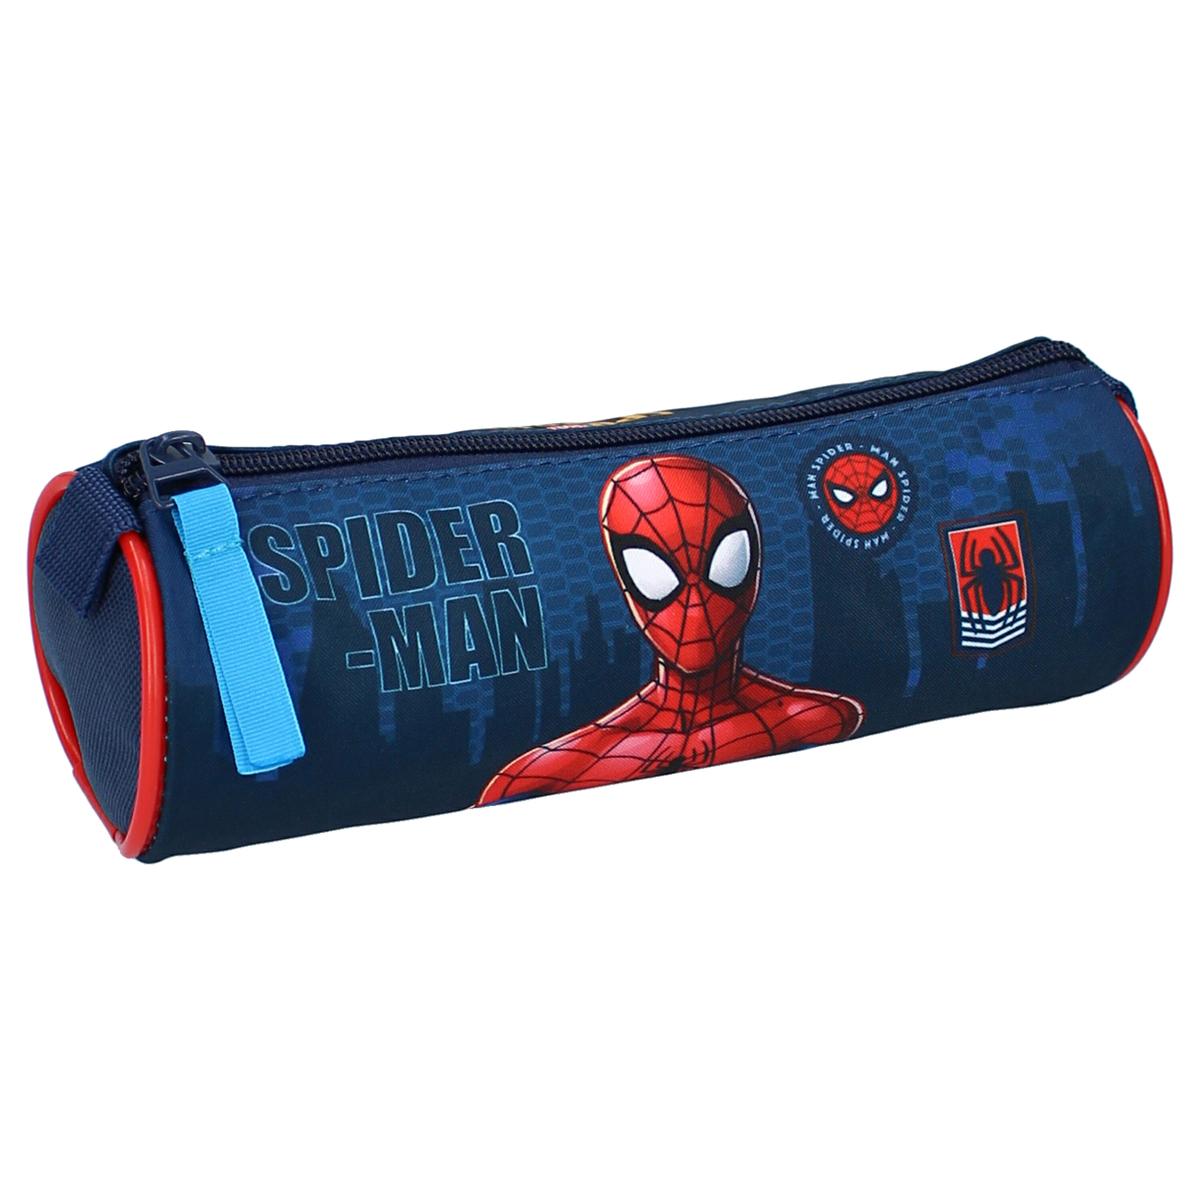 Trousse tube \'Spiderman\' bleu rouge - 20x7 cm - [A3032]